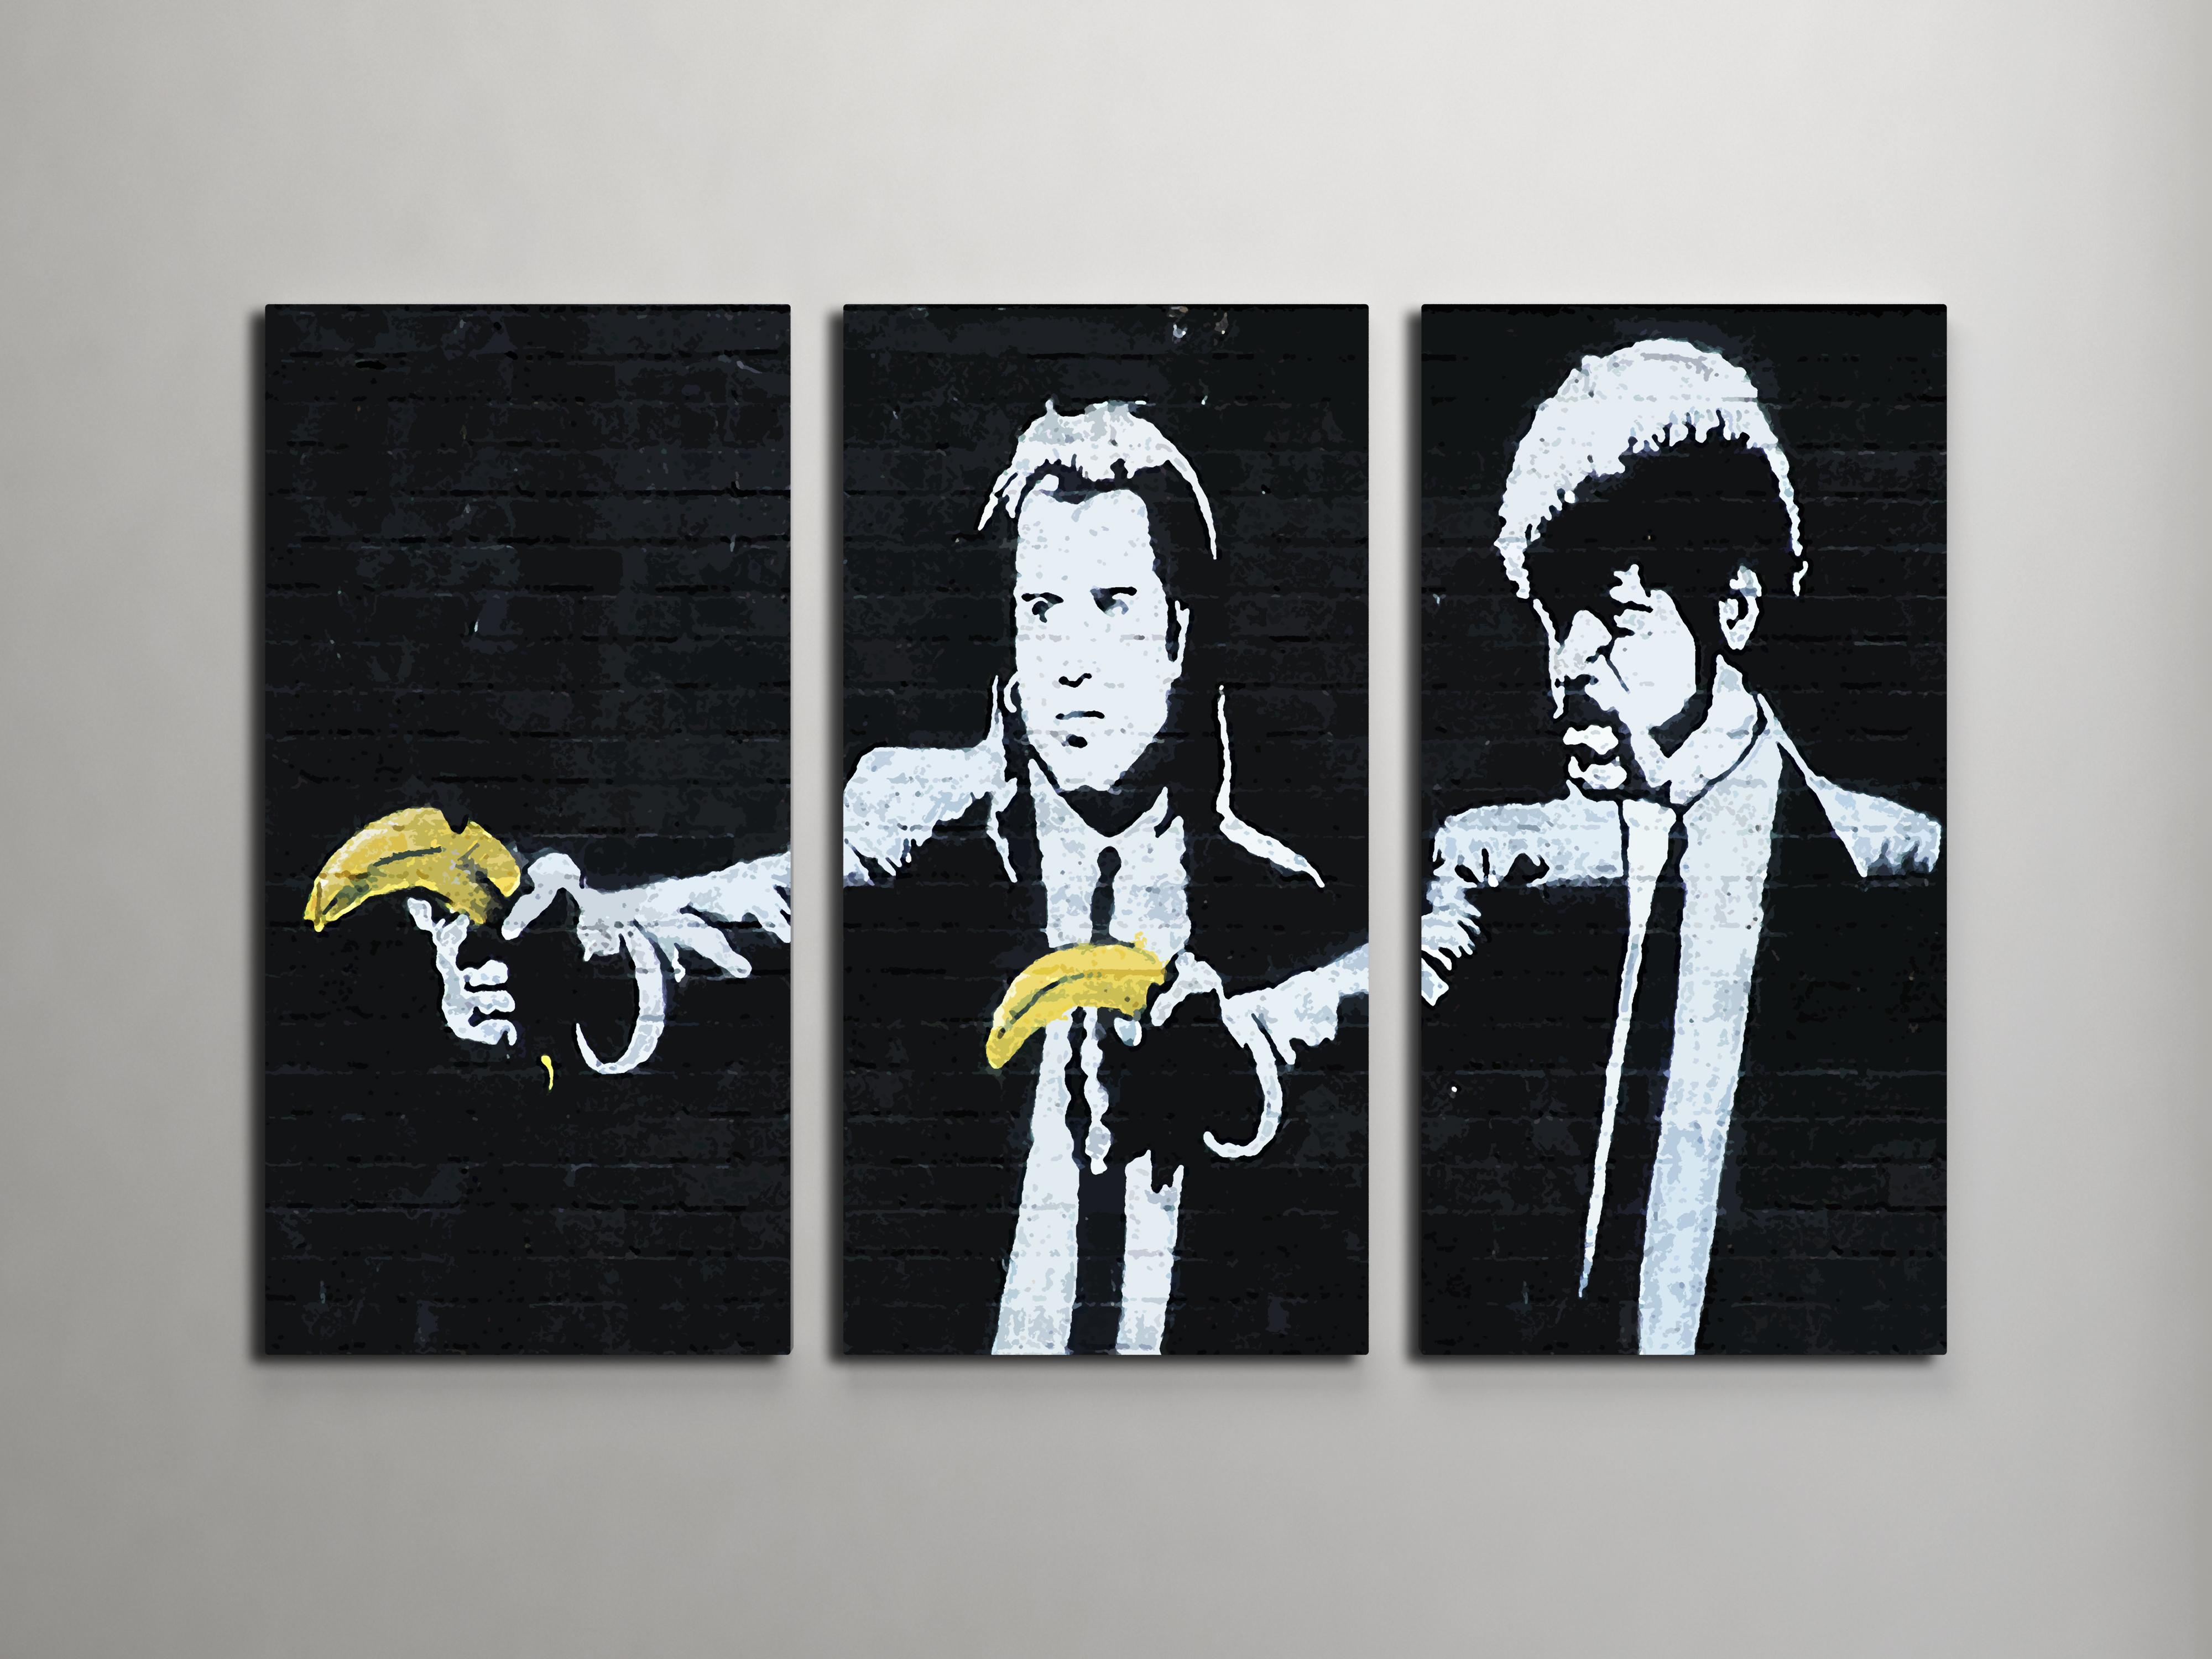 Pulp Fiction Street Art Pics, Artistic Collection